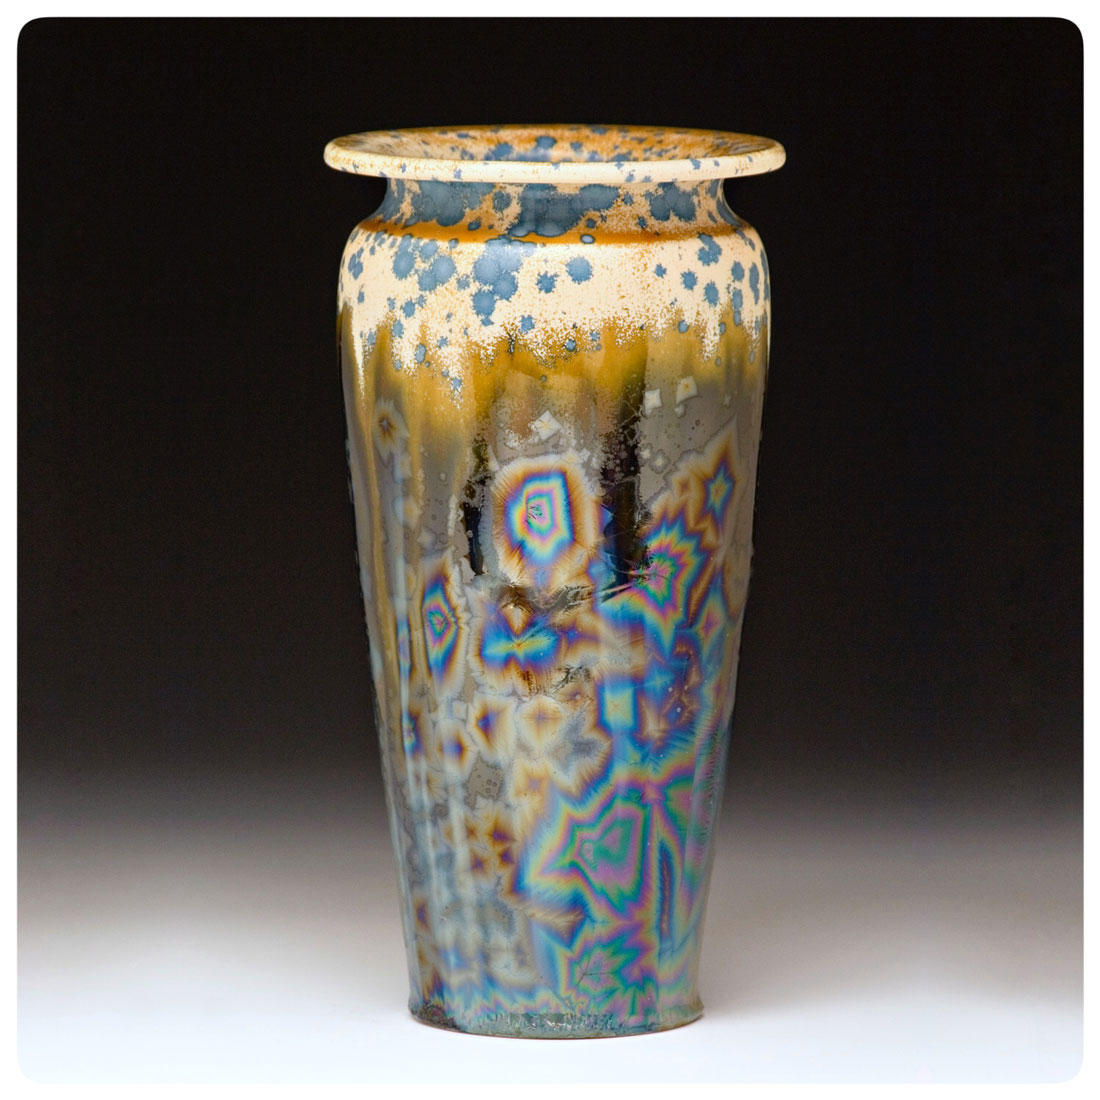 Molybdenum-Crystalline-Vase-made-by-Bruce-Gholson.jpg